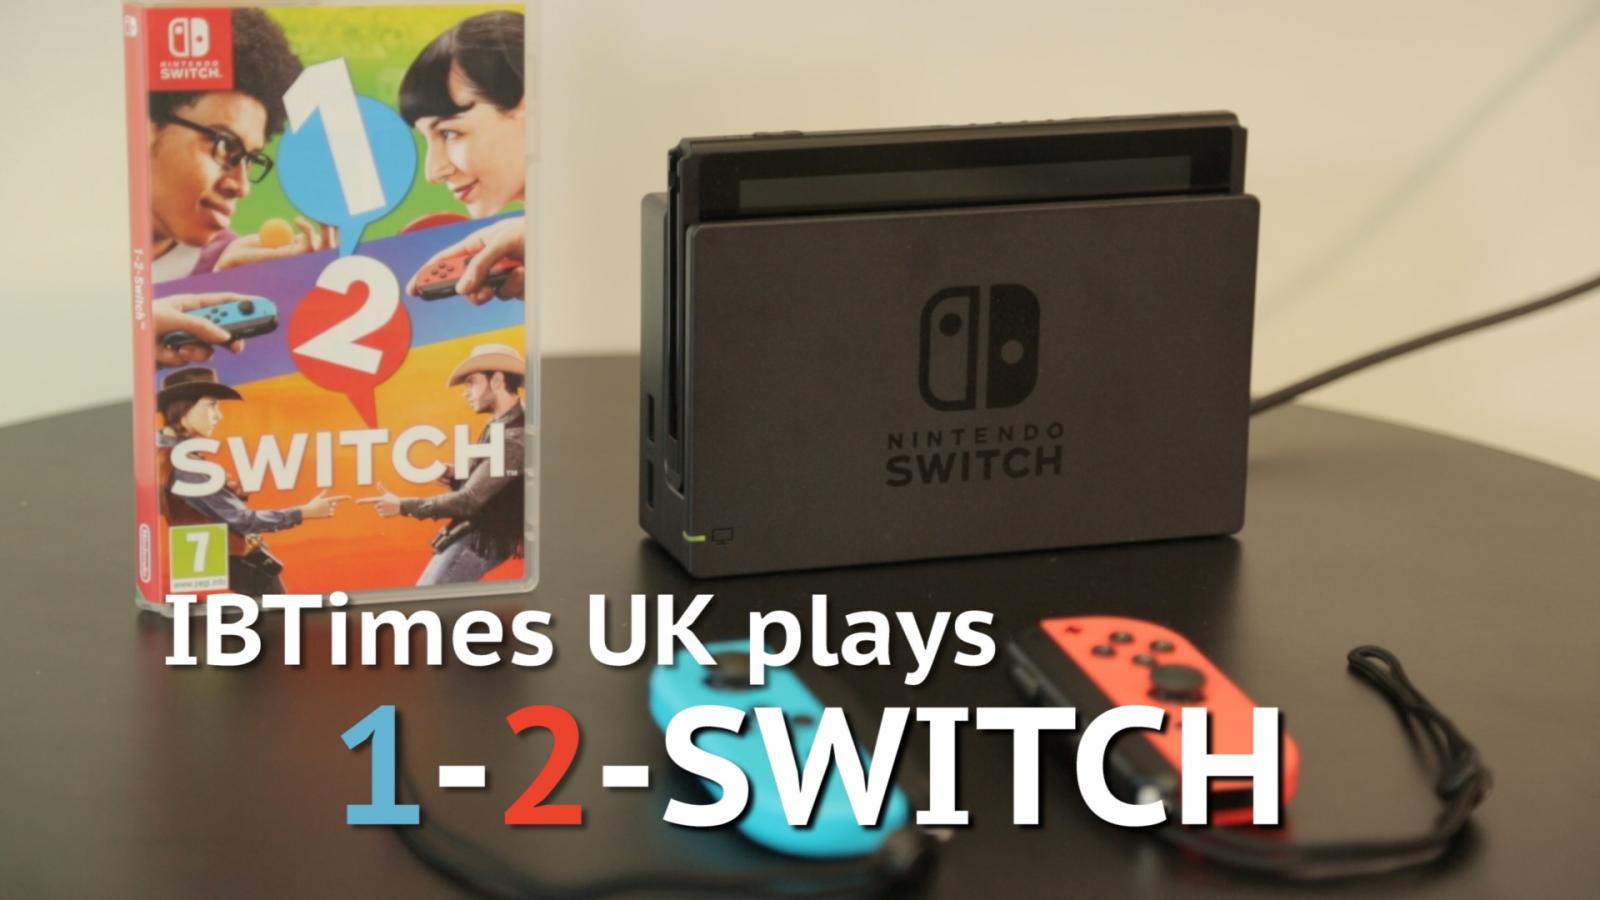 1 2 switch mini games